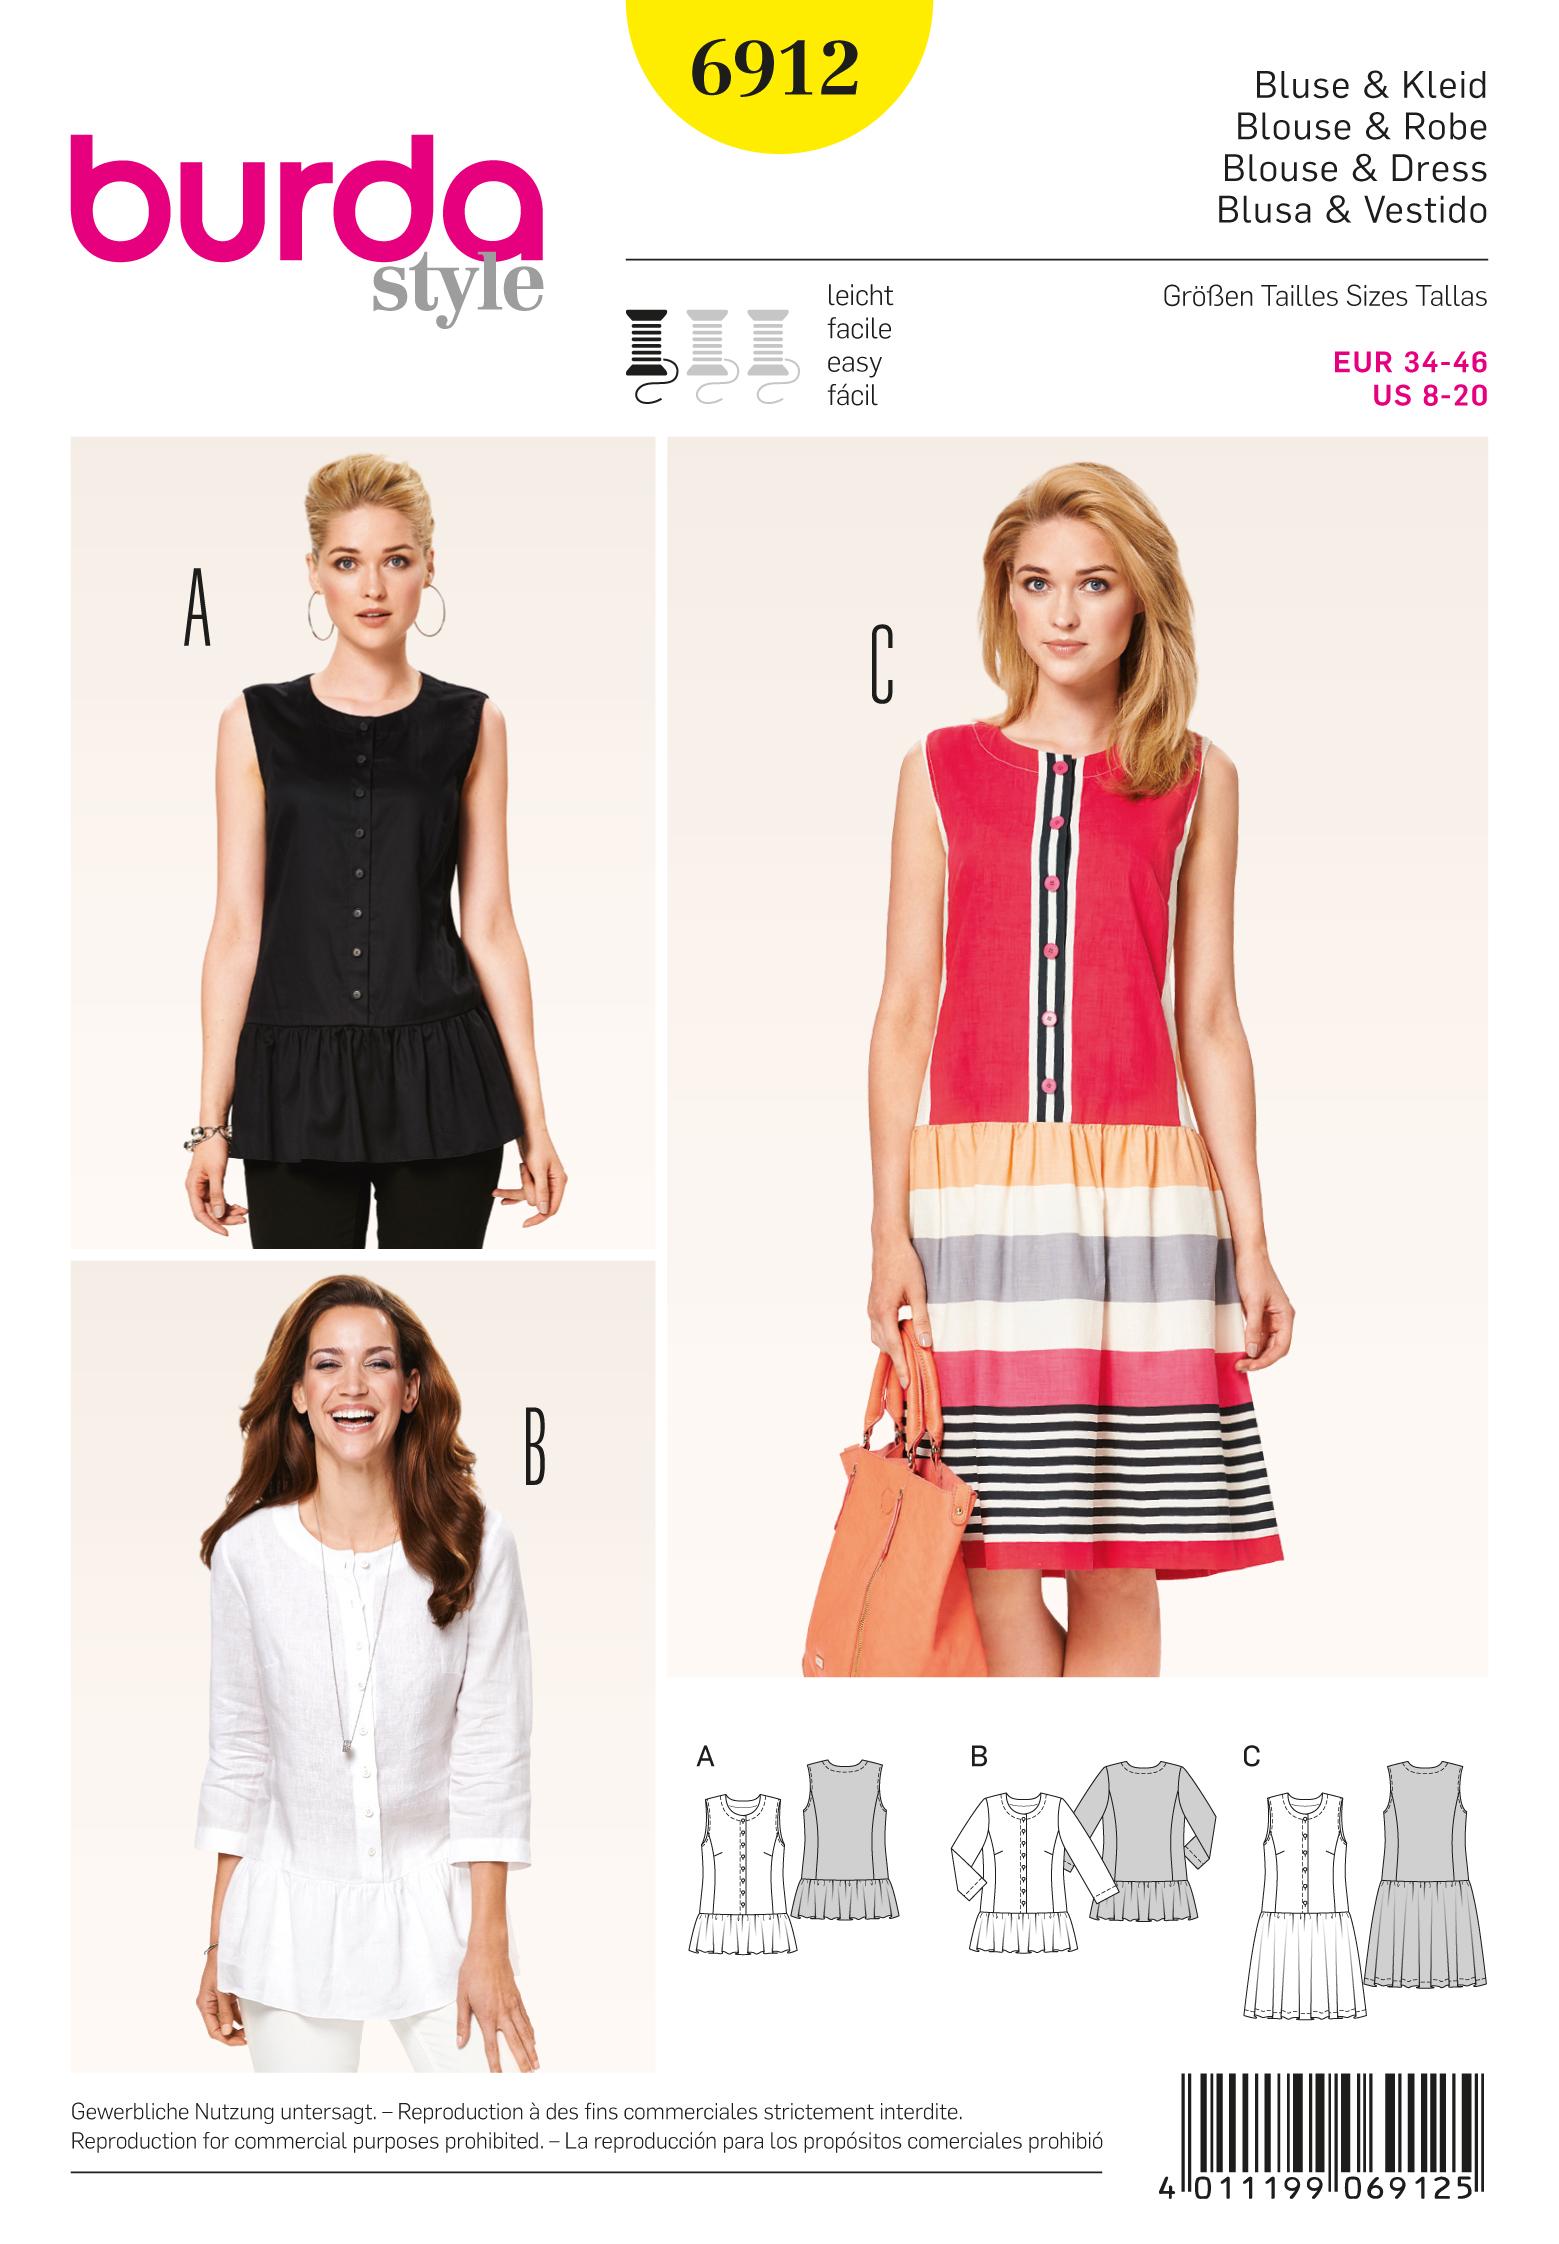 Burda Dresses 6912